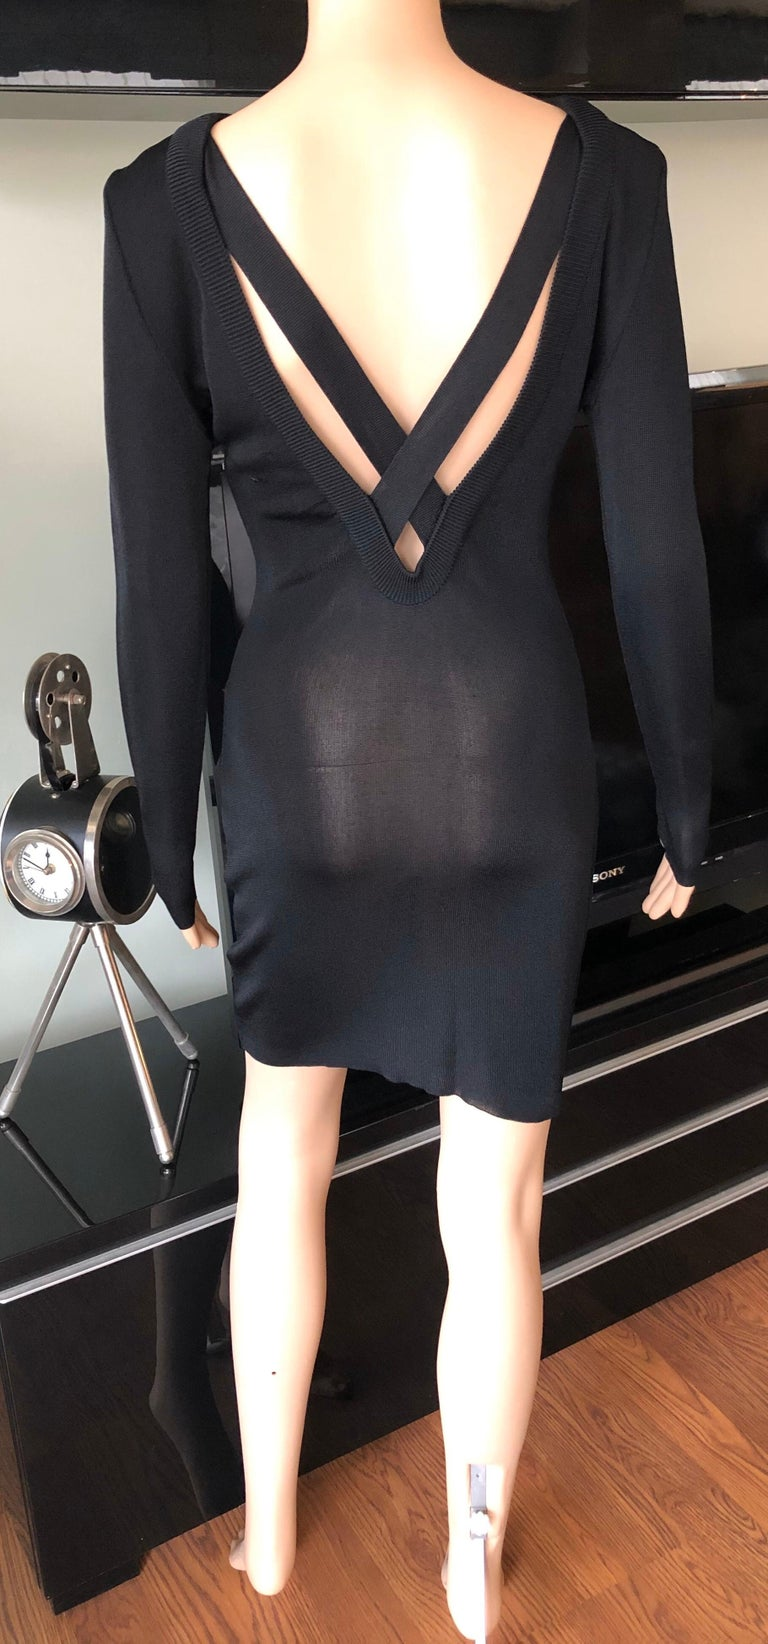 Gianni Versace c. 1980 Vintage Semi-Sheer Bodycon Knit Black Dress For Sale 2